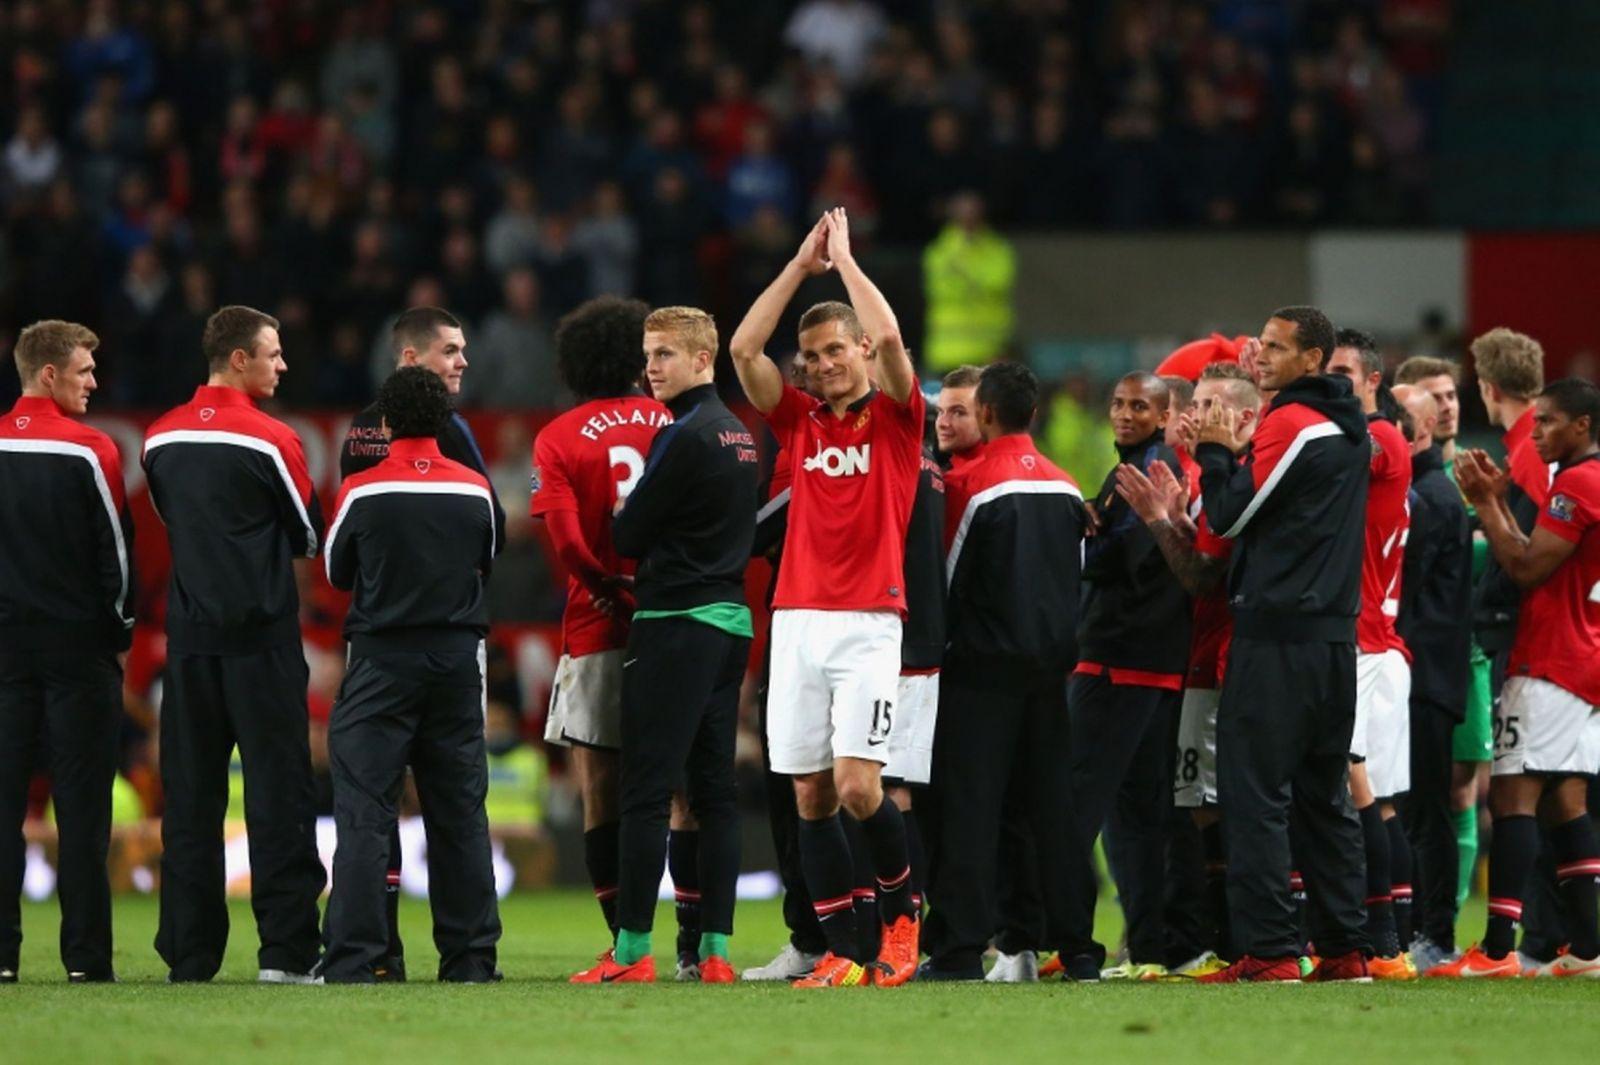 [Изображение: Manchester-United-v-Hull-City-Premier-League%20(7).jpg]